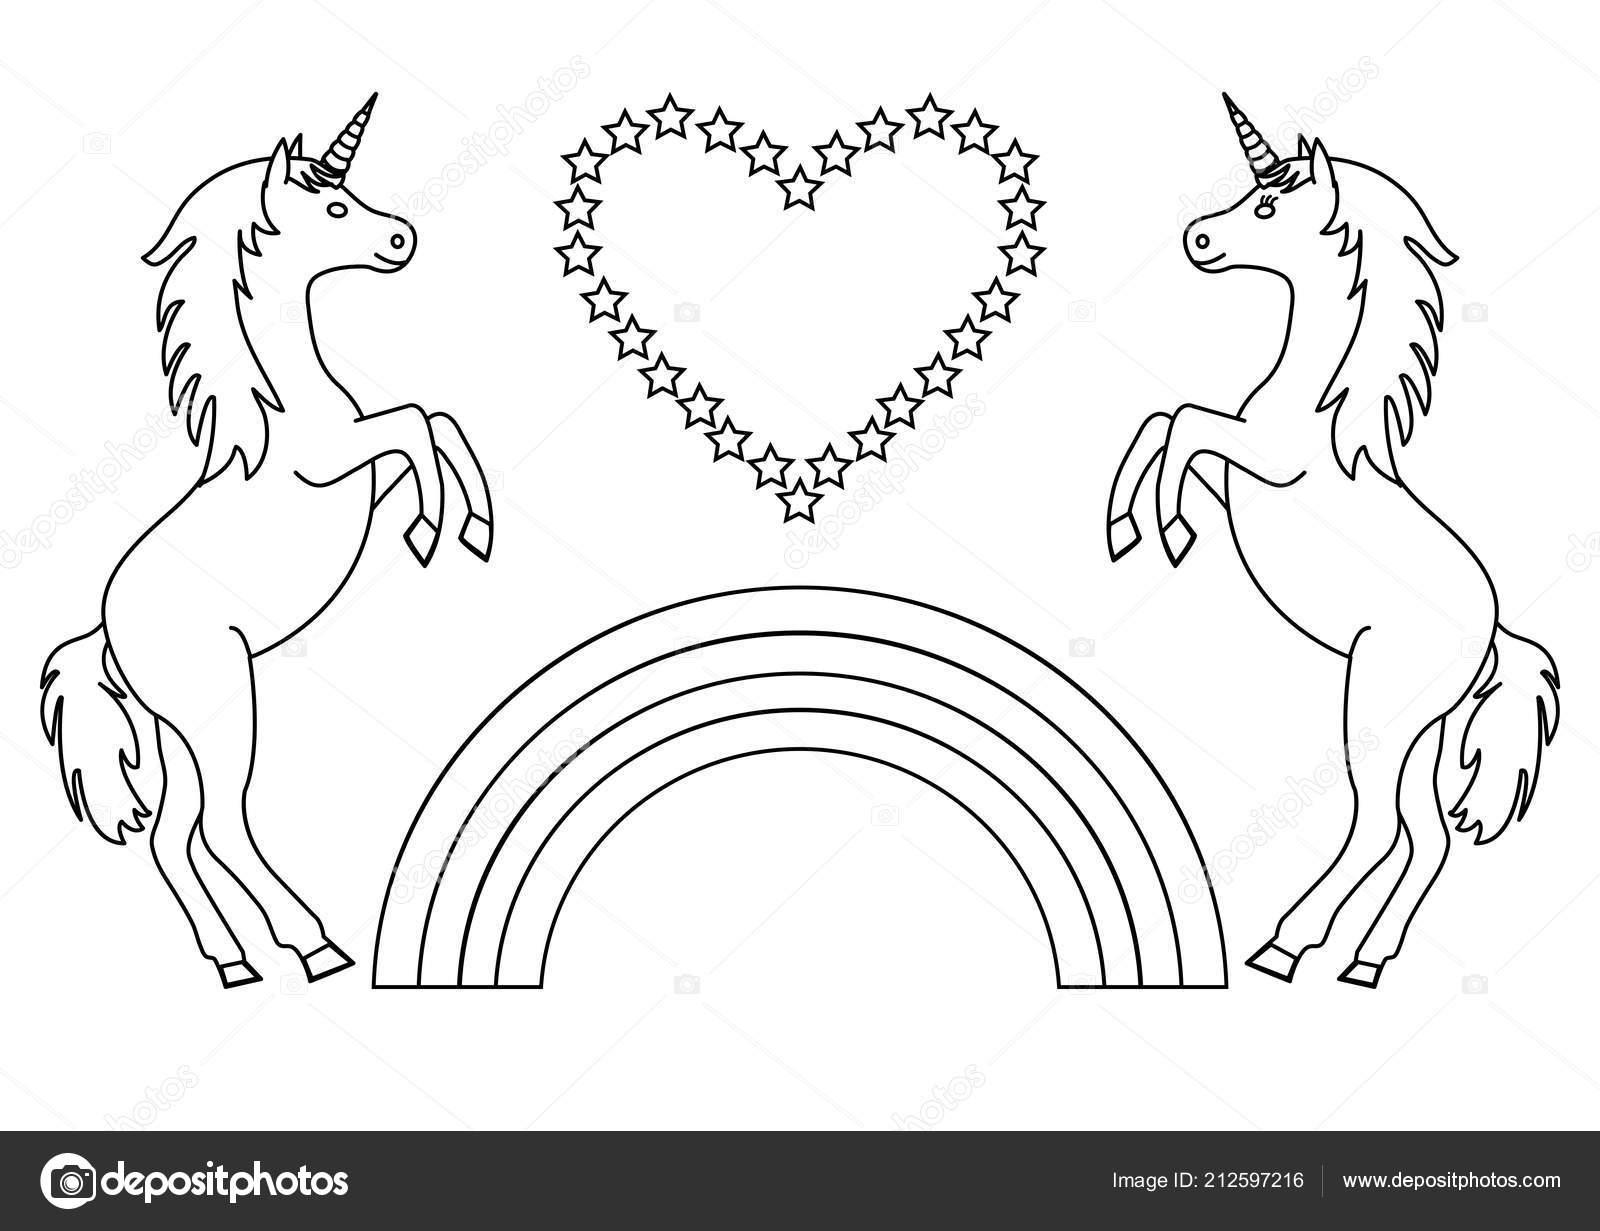 Couple unicorns rainbow heart stars coloring page children vector illustration stock illustration